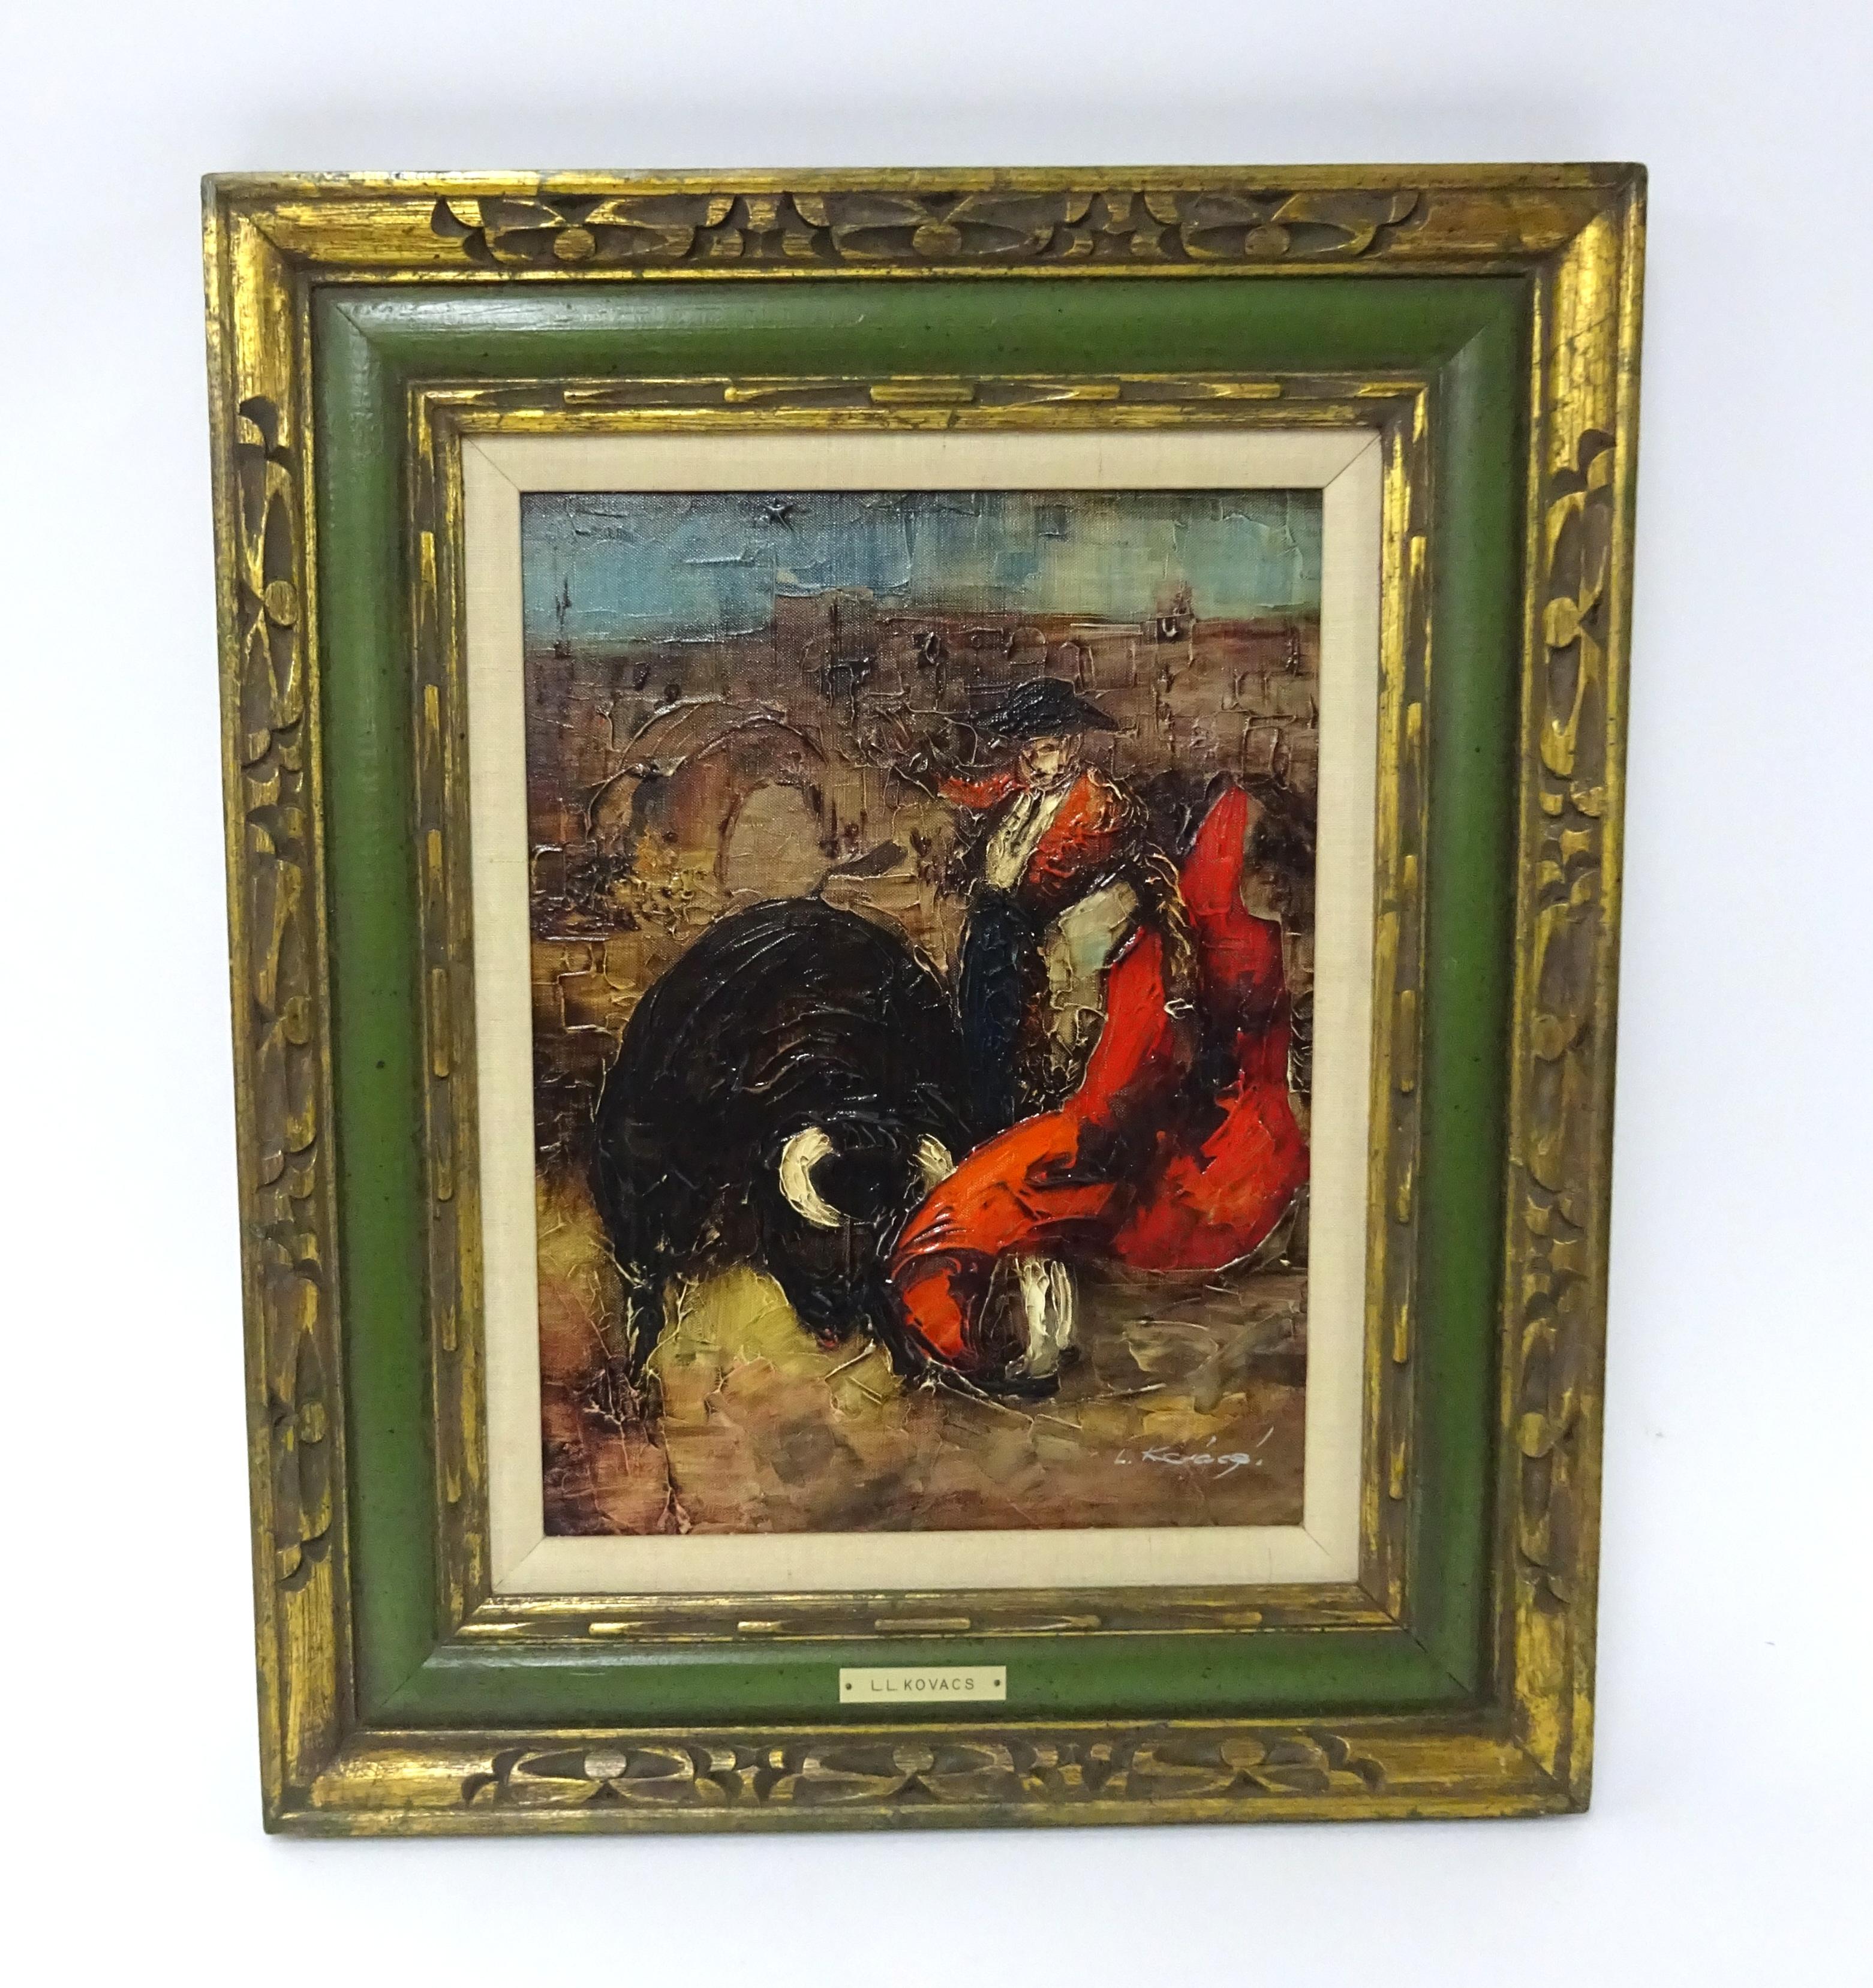 Lot 033 - Levente Kovacs (b1922), oil on canvas 'Spanish bull fighter', signed, 40cm x 30cm.